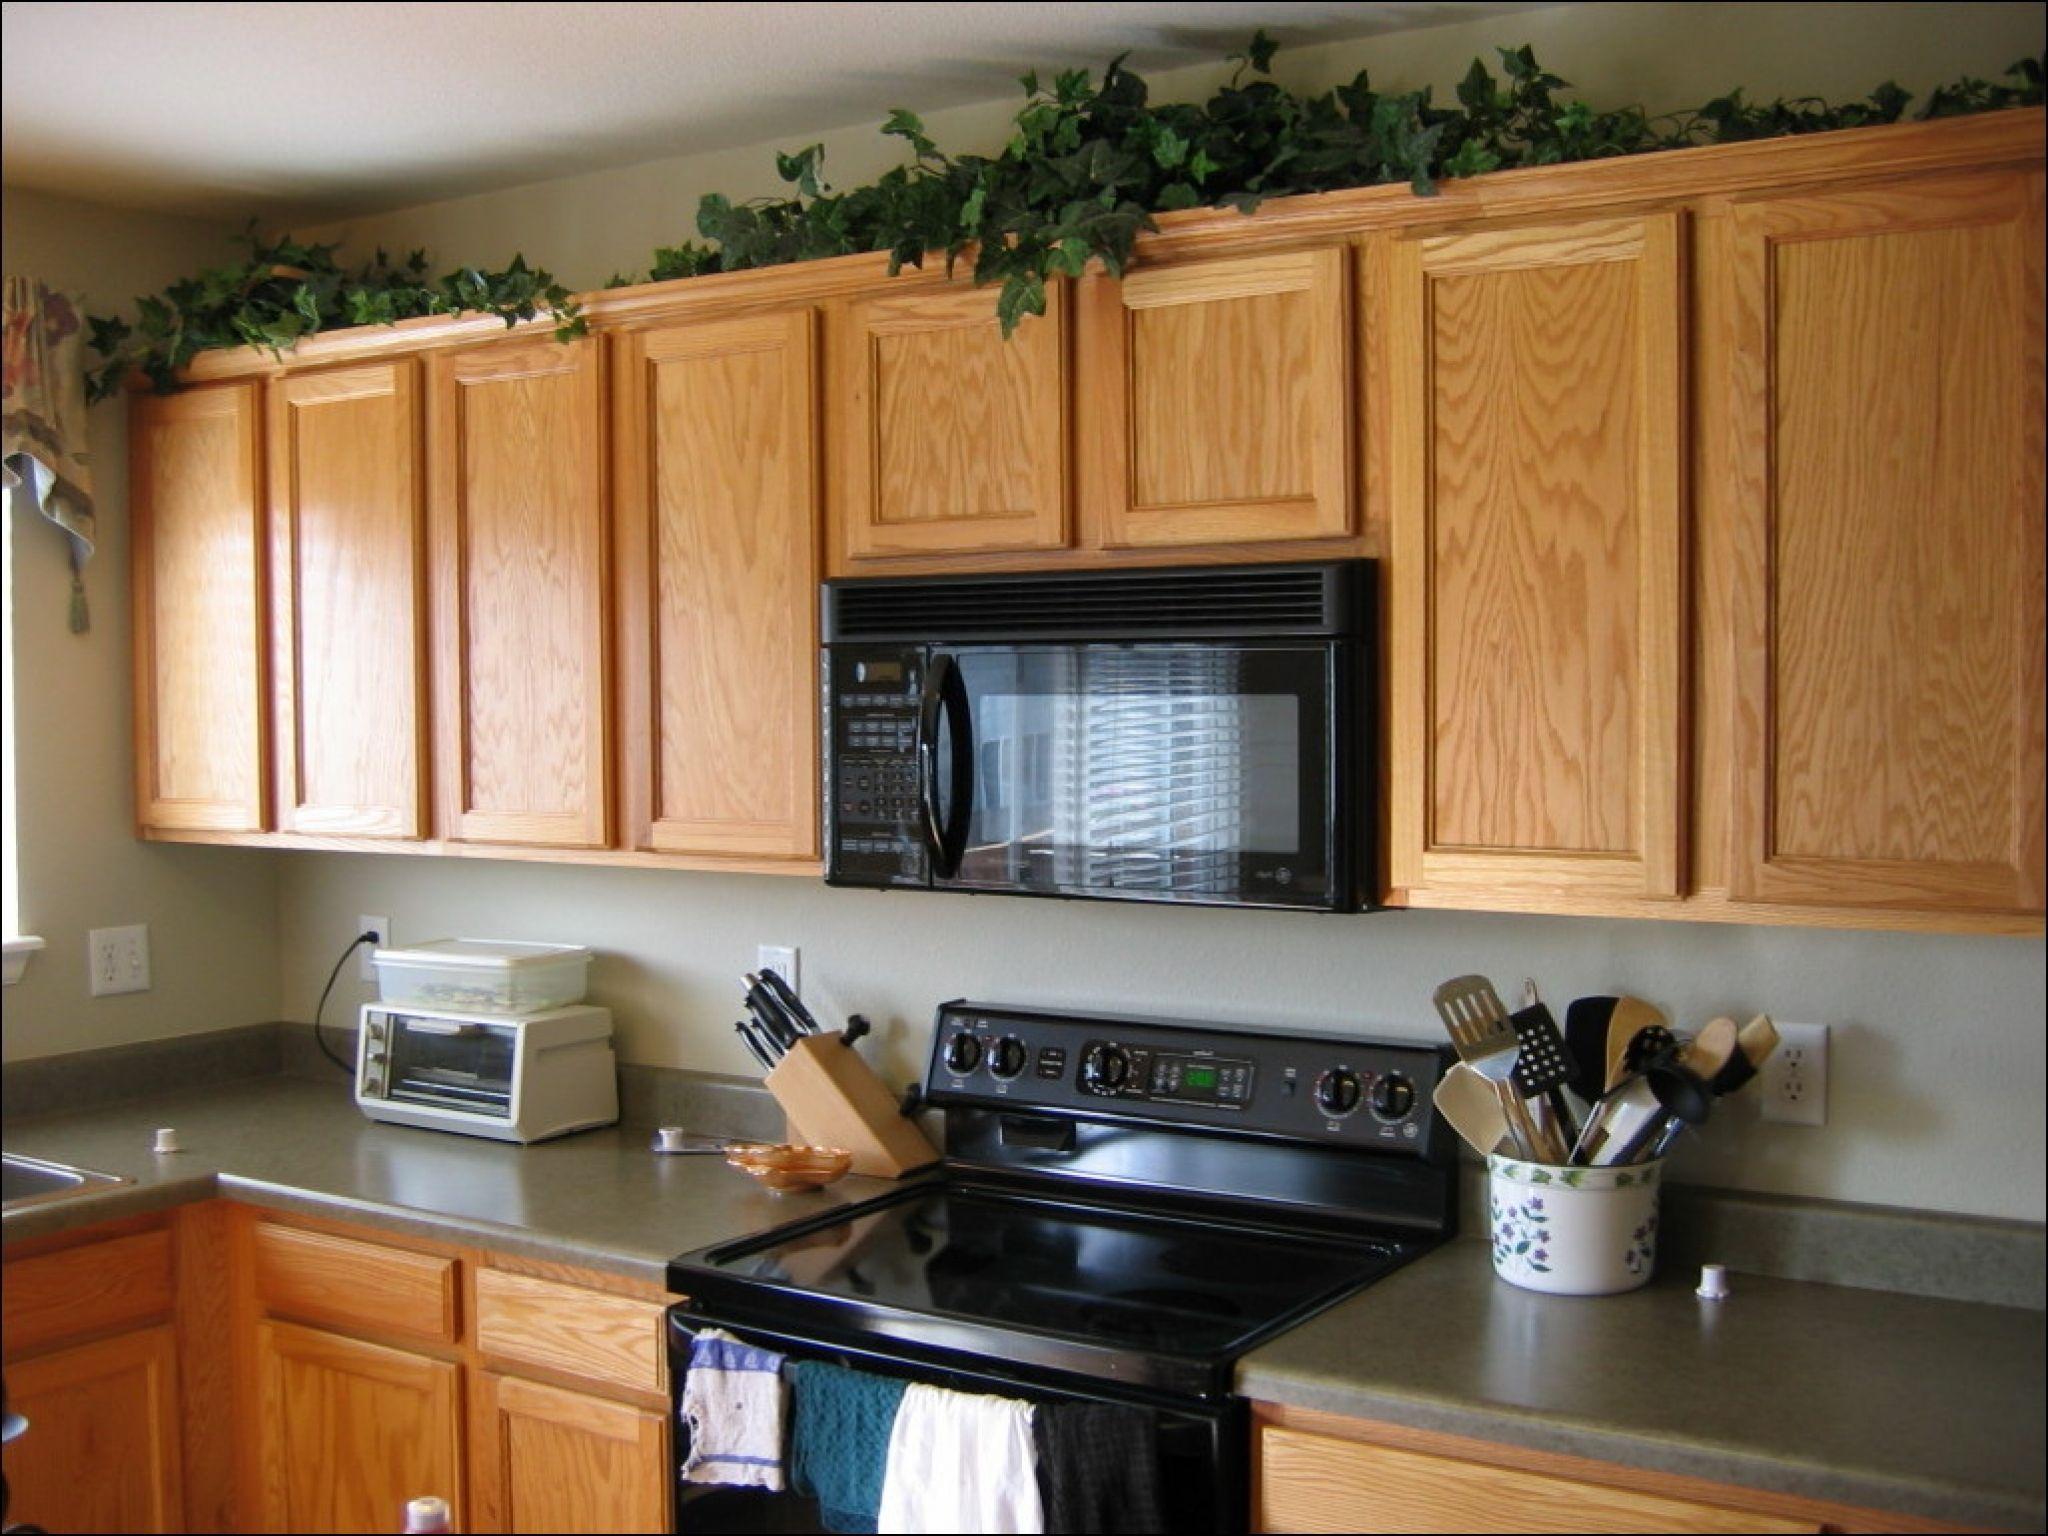 greenery above kitchen cabinets - diy kitchen countertop ...